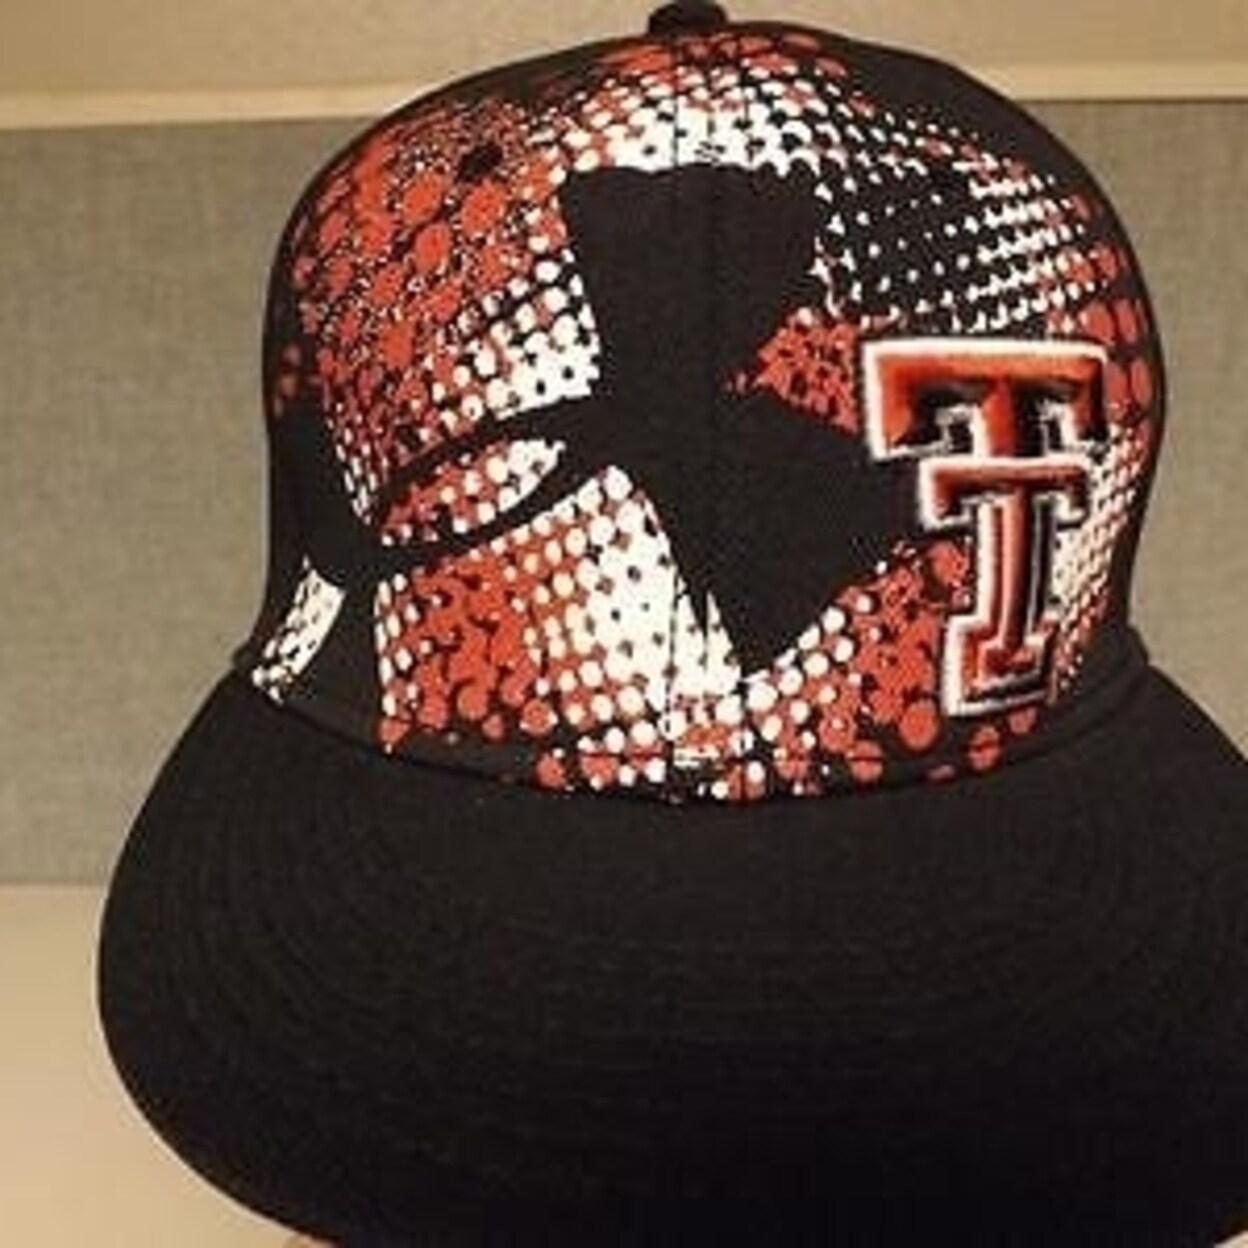 b49b7f12edb ... sale shop texas tech red raiders mens under armour size osfa snapback  hat on sale free